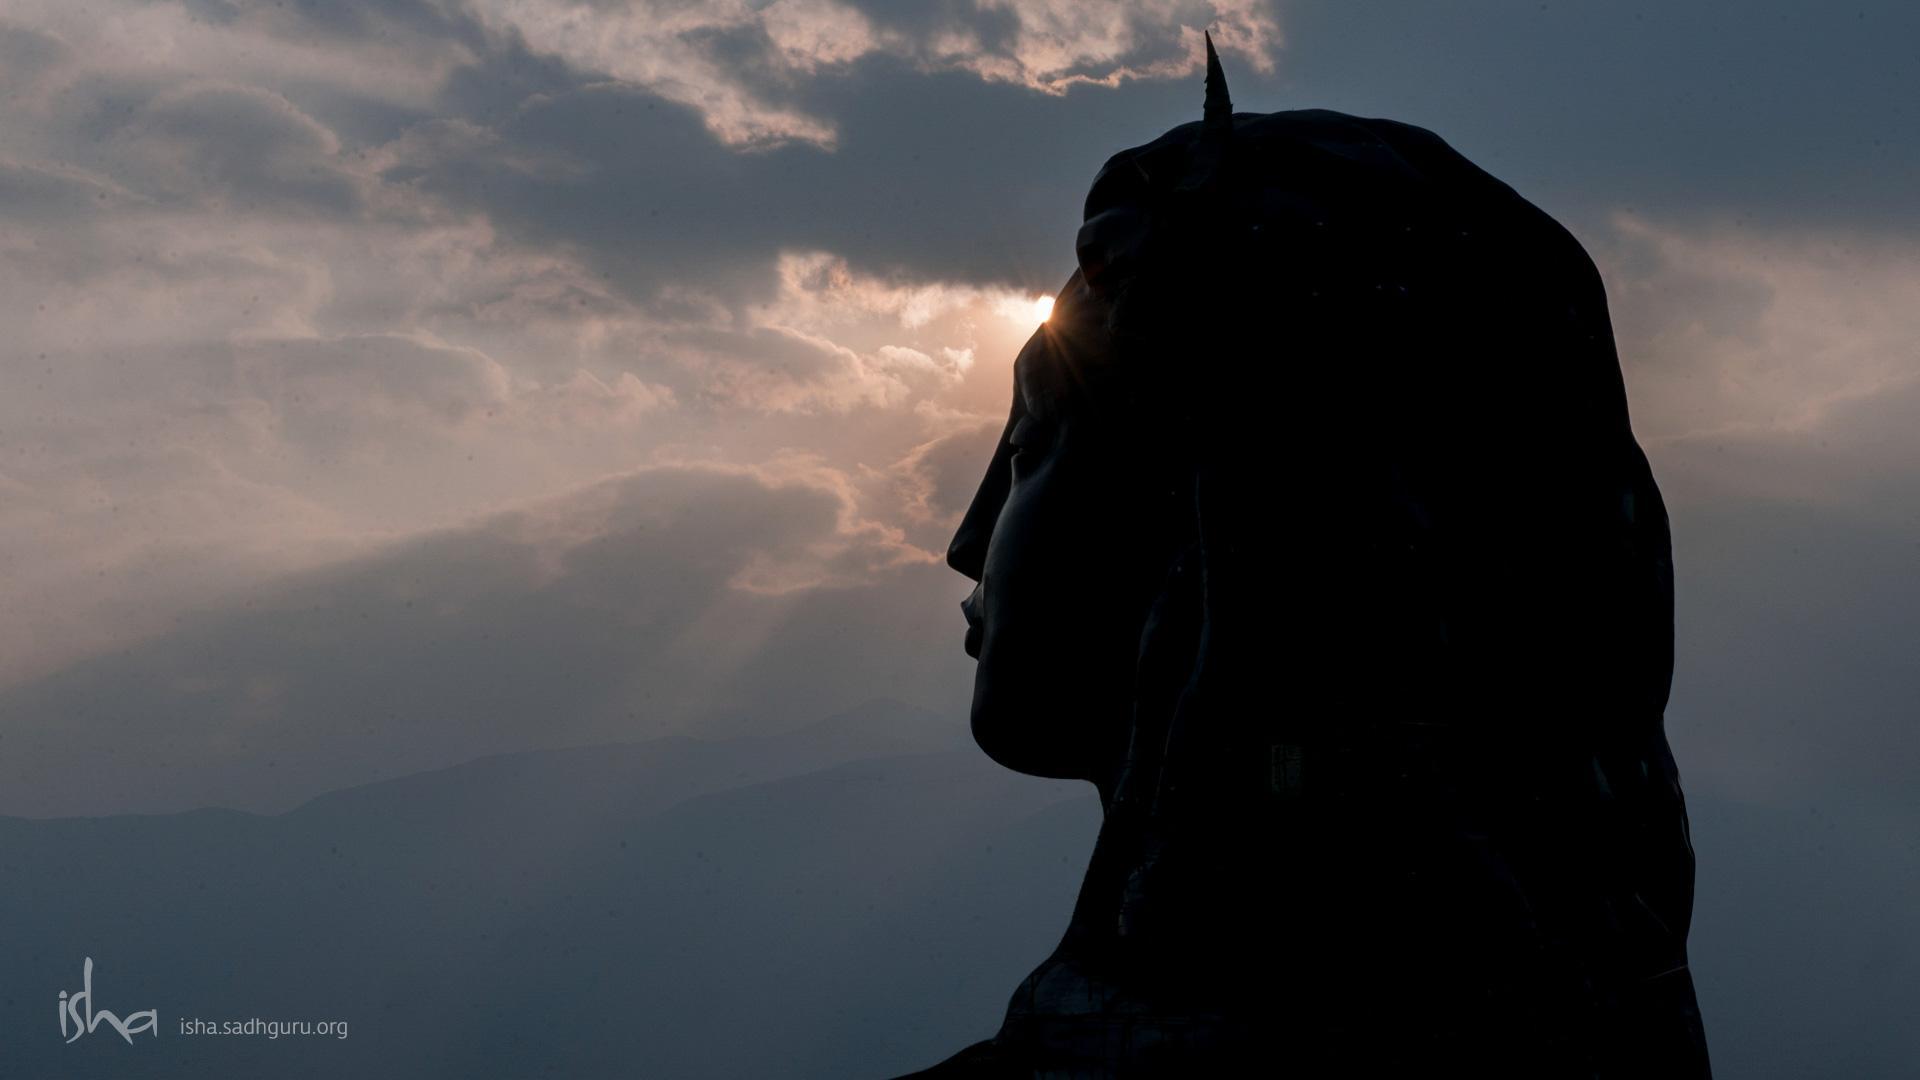 Mahashivratri Images - The Adiyogi with setting Sun HD